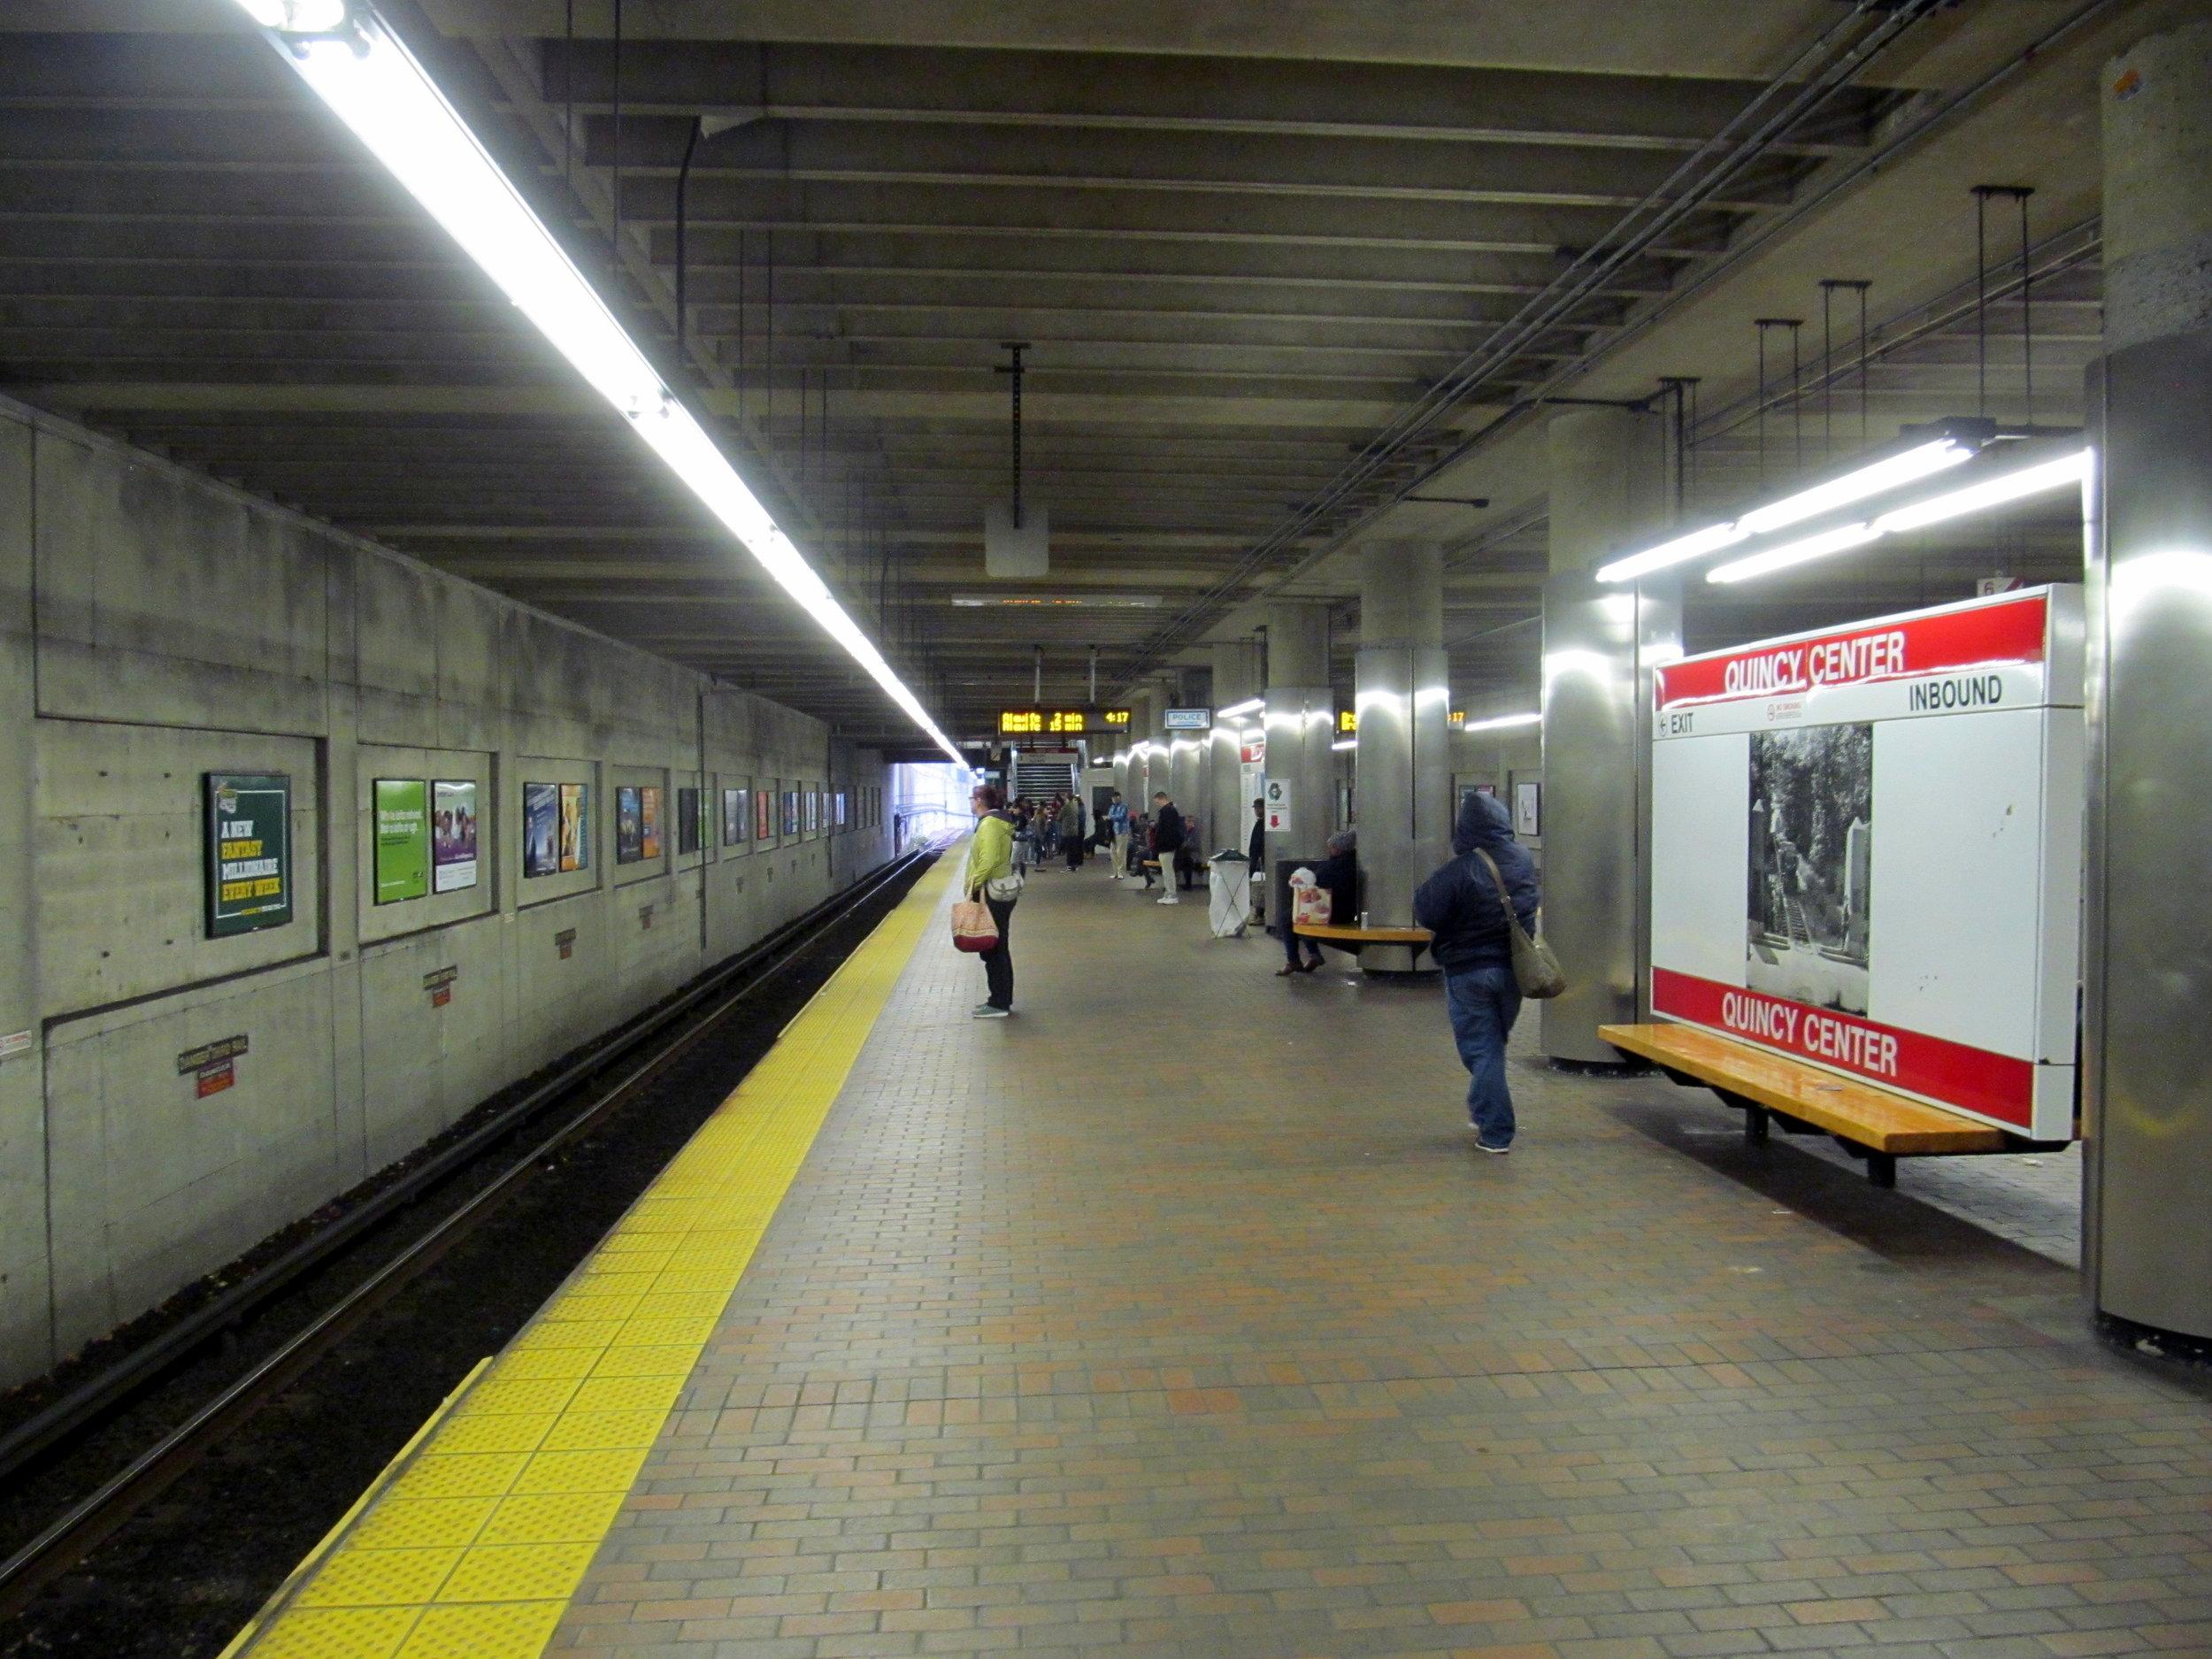 Red_Line_platform_at_Quincy_Center,_October_2015.JPG